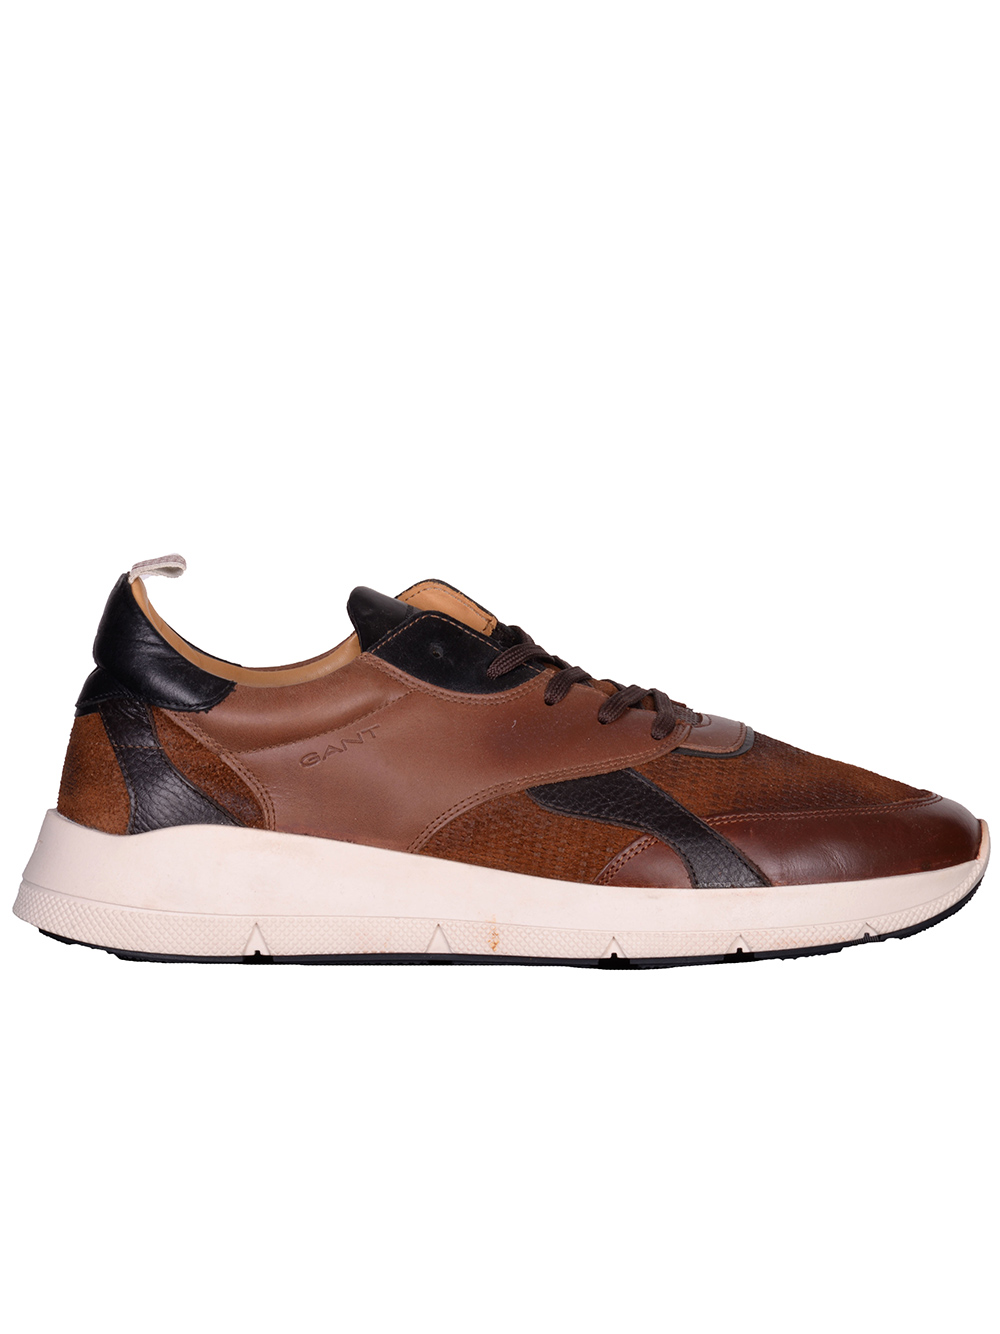 GANT Παπούτσια δετά 3GS19634928-45 ΚΑΦΕ